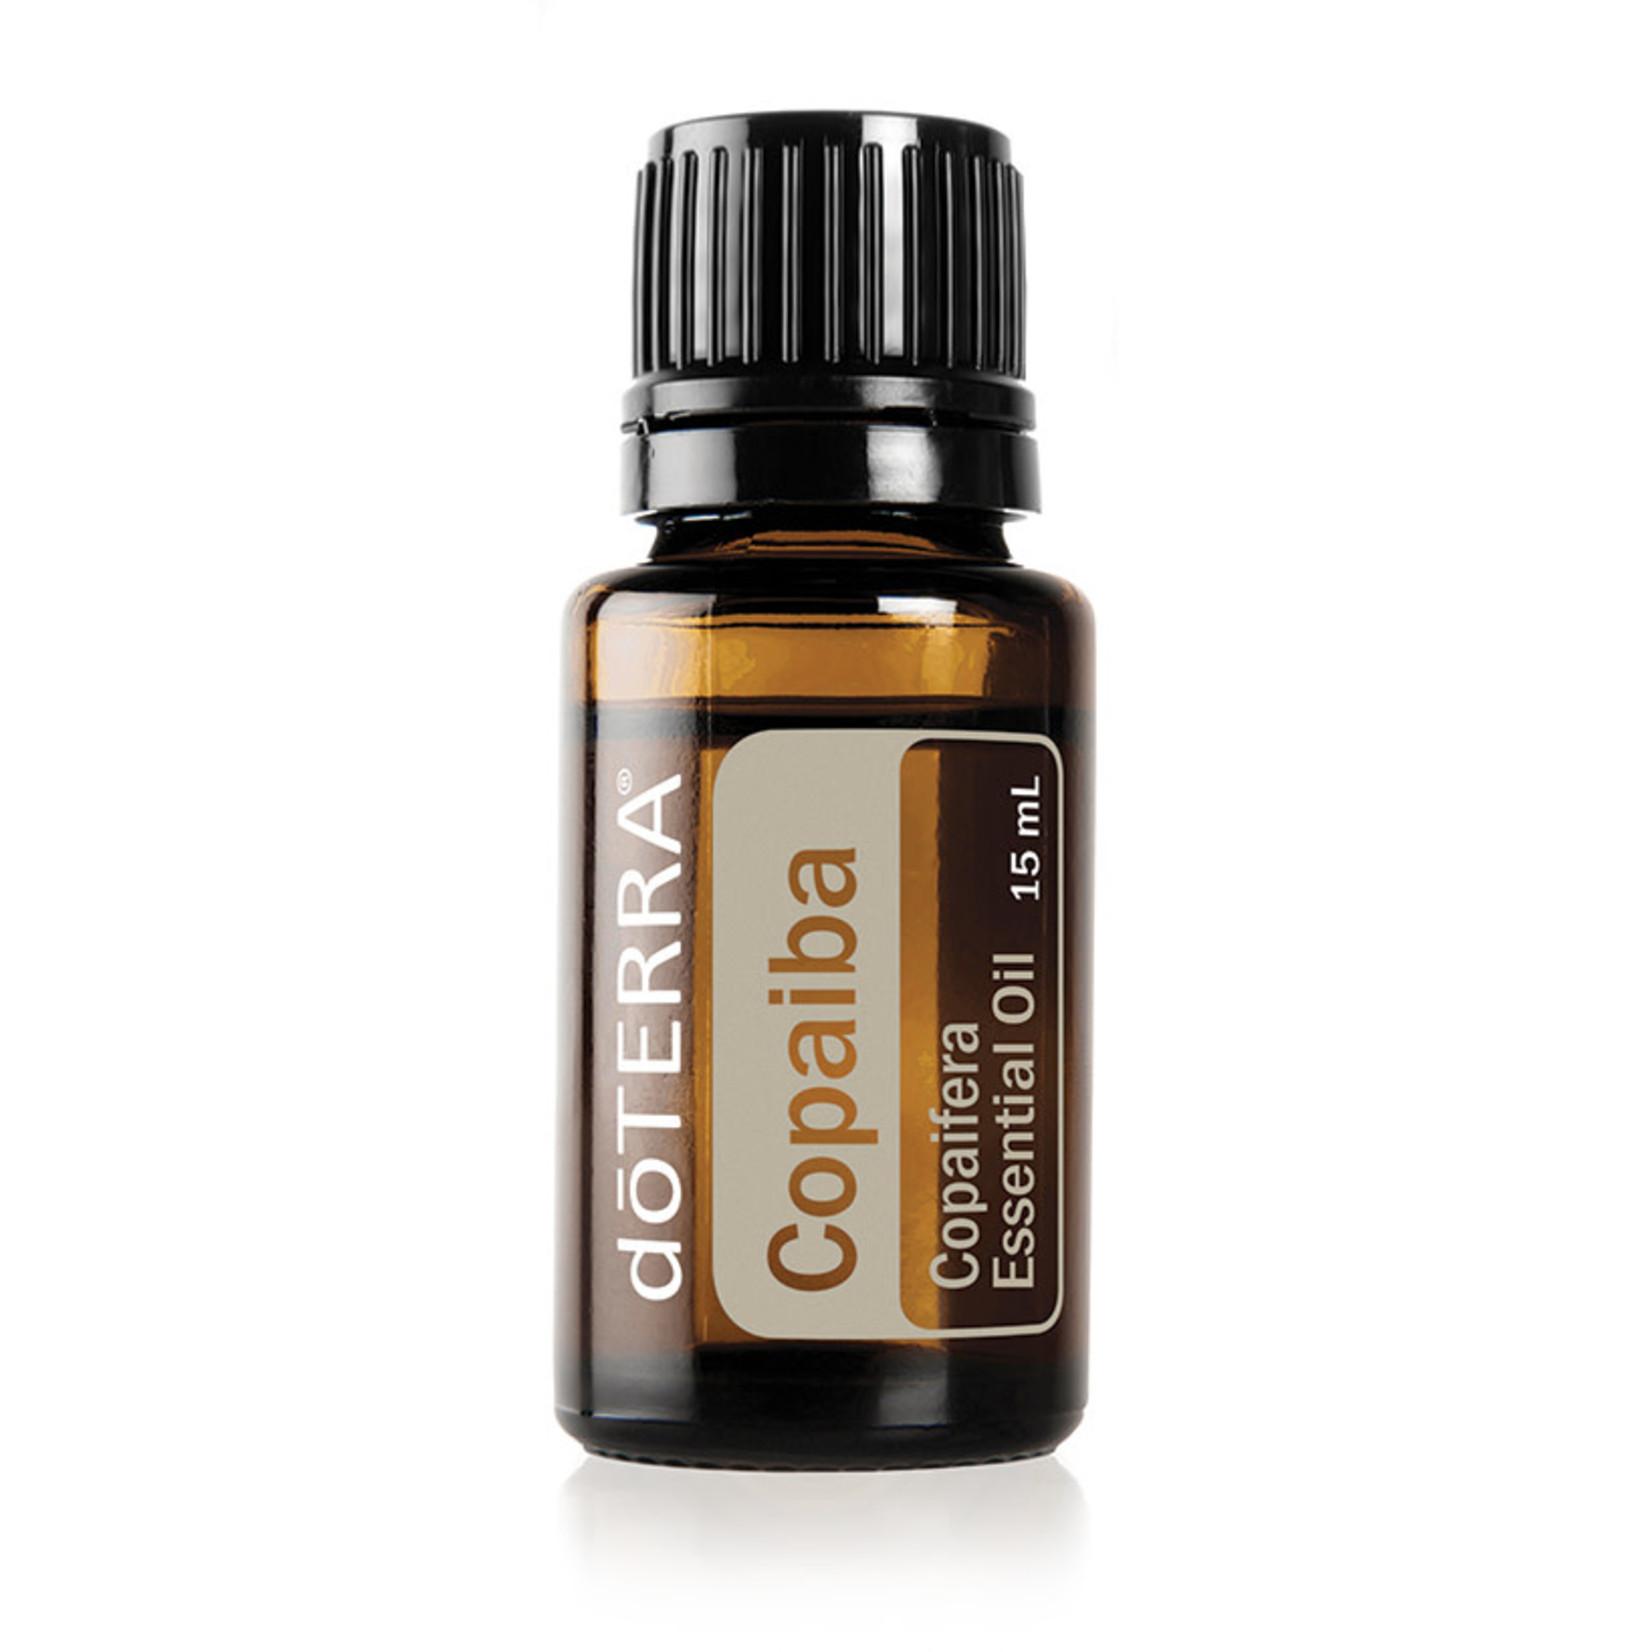 doTERRA doTERRA Essential Oil Copaiba 15ml